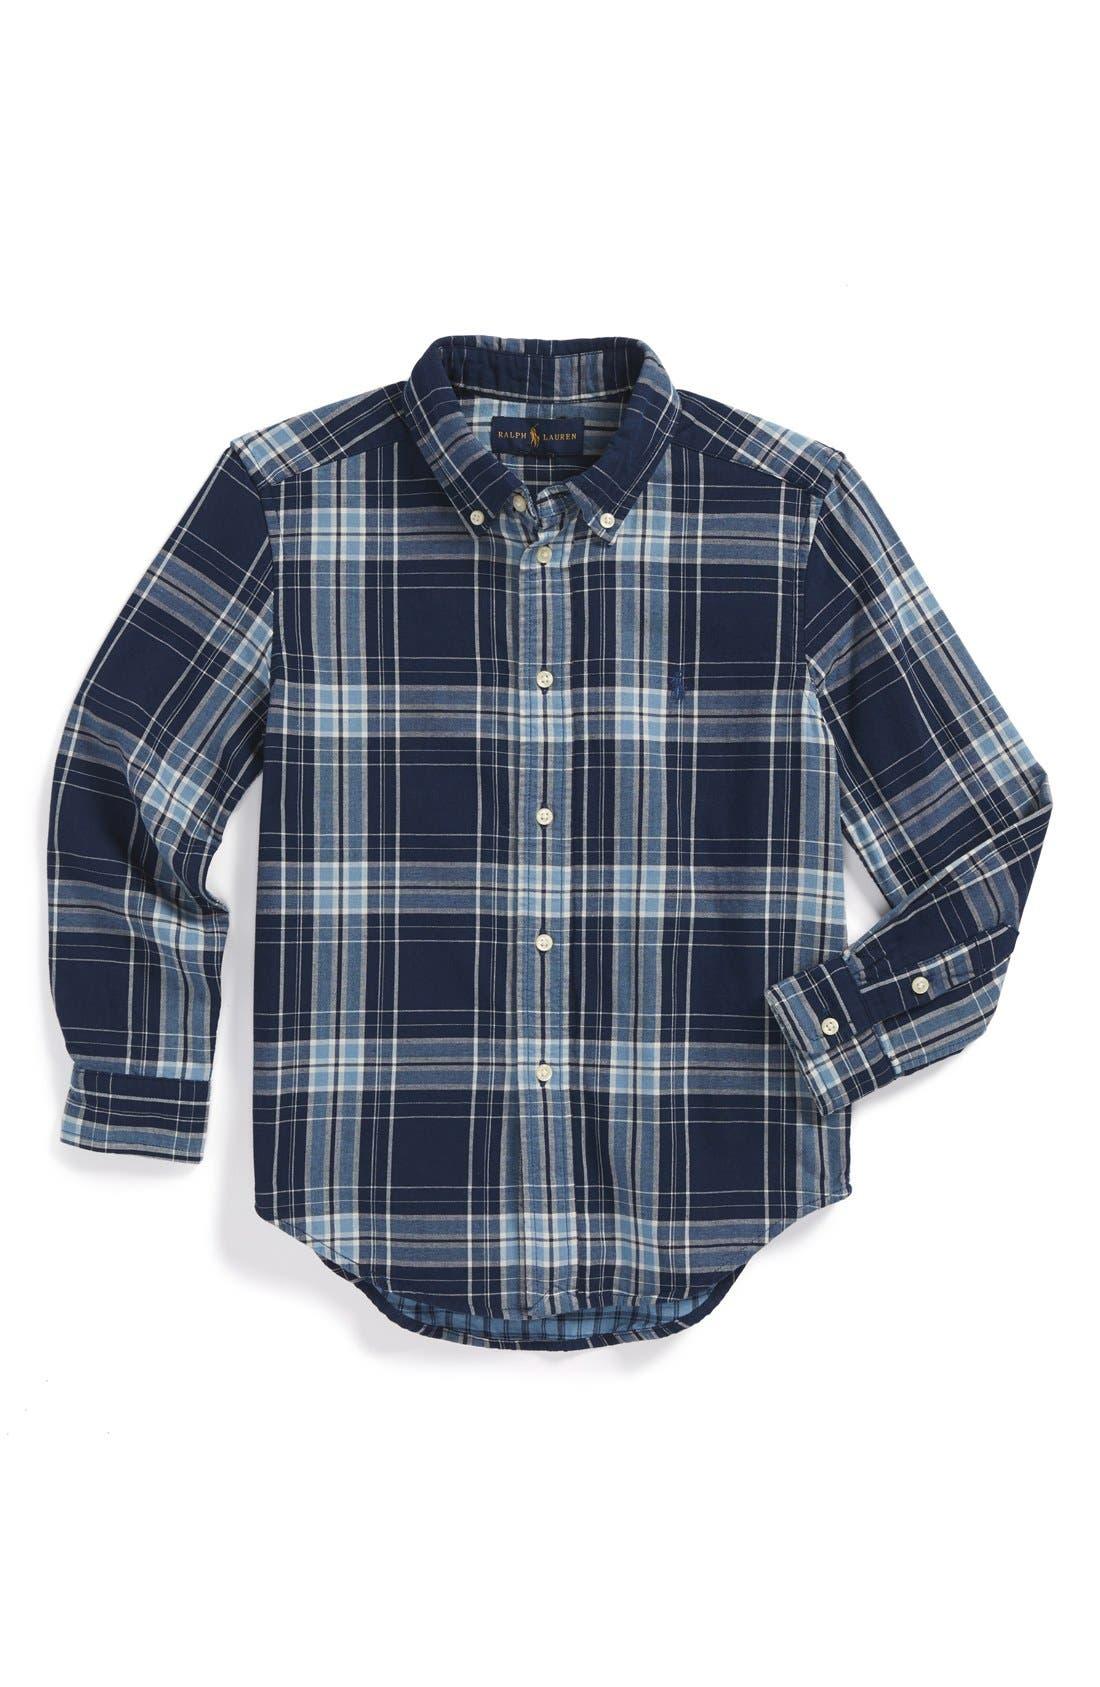 Alternate Image 1 Selected - Ralph Lauren 'Blake' Long Sleeve Woven Sport Shirt (Little Boys)